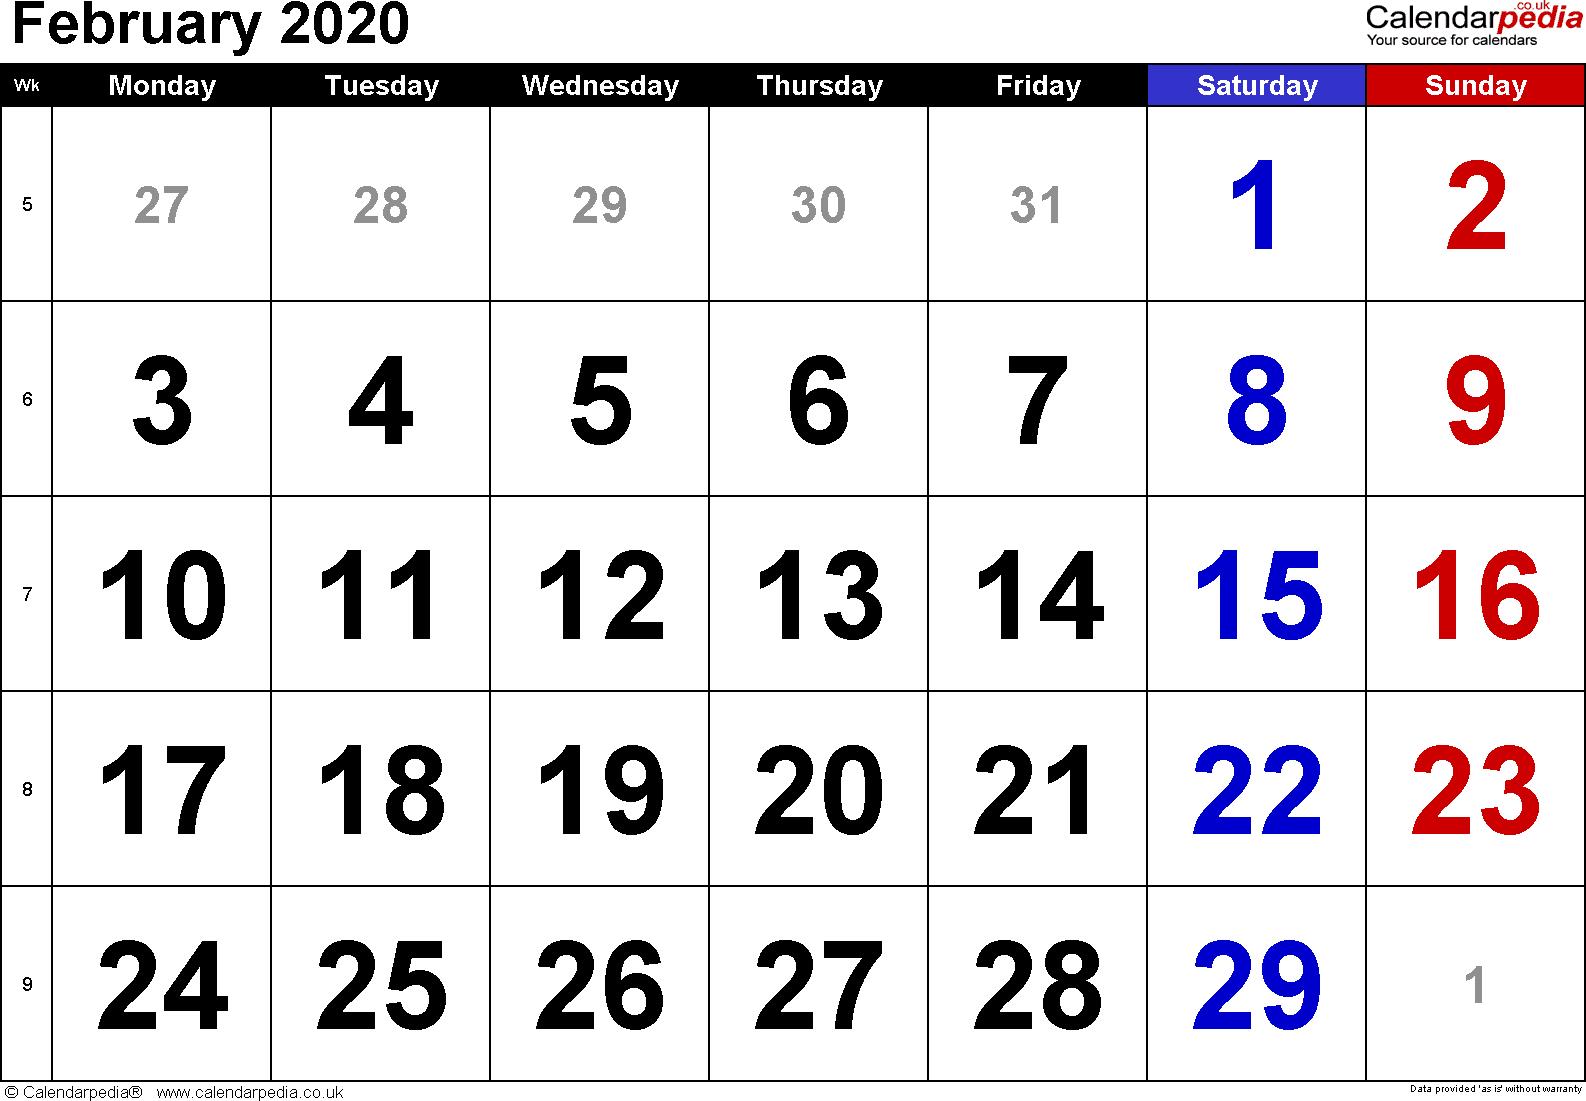 February 2020 Calendar Uk - Wpa.wpart.co